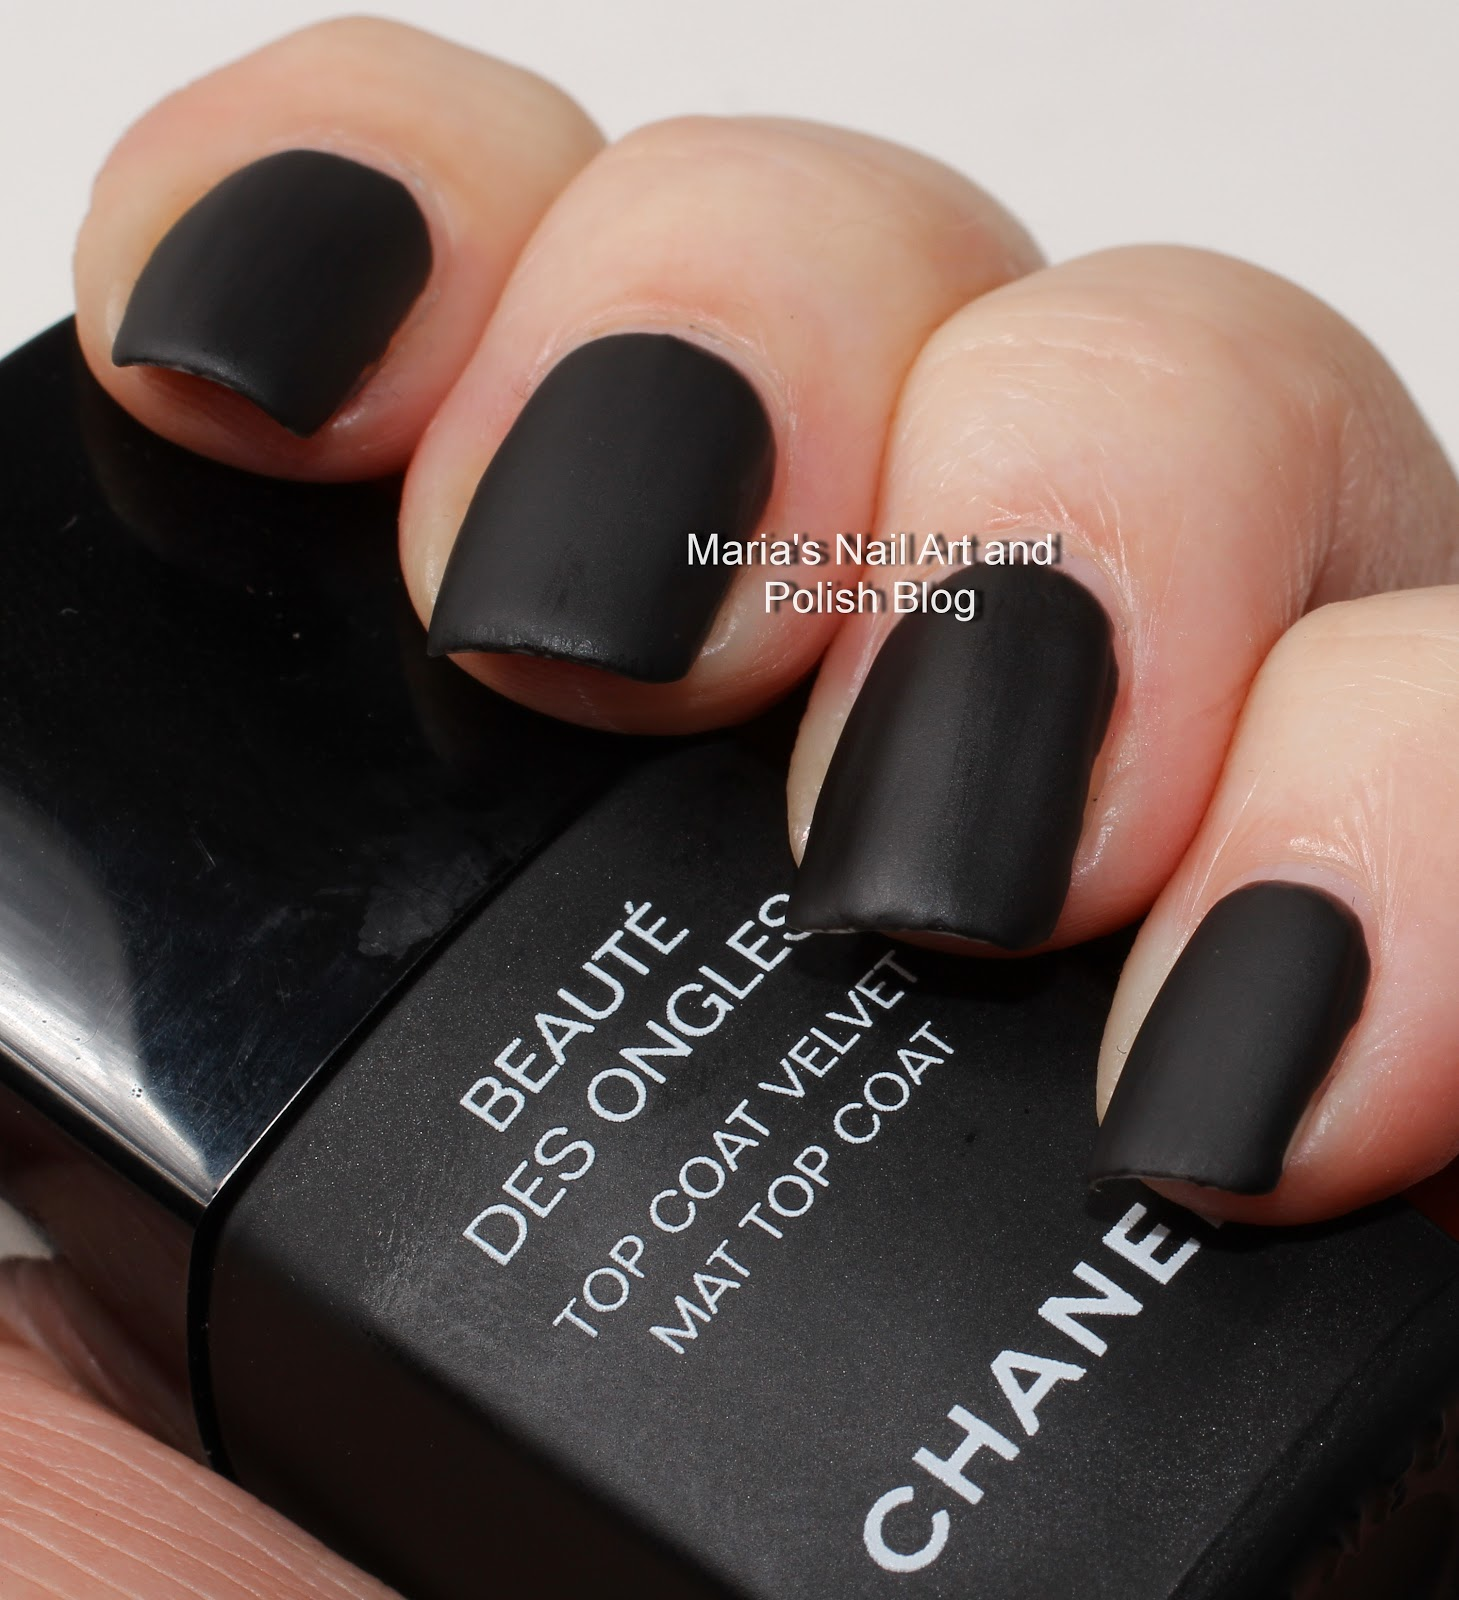 Marias Nail Art And Polish Blog: Chanel Velvet Mat Top